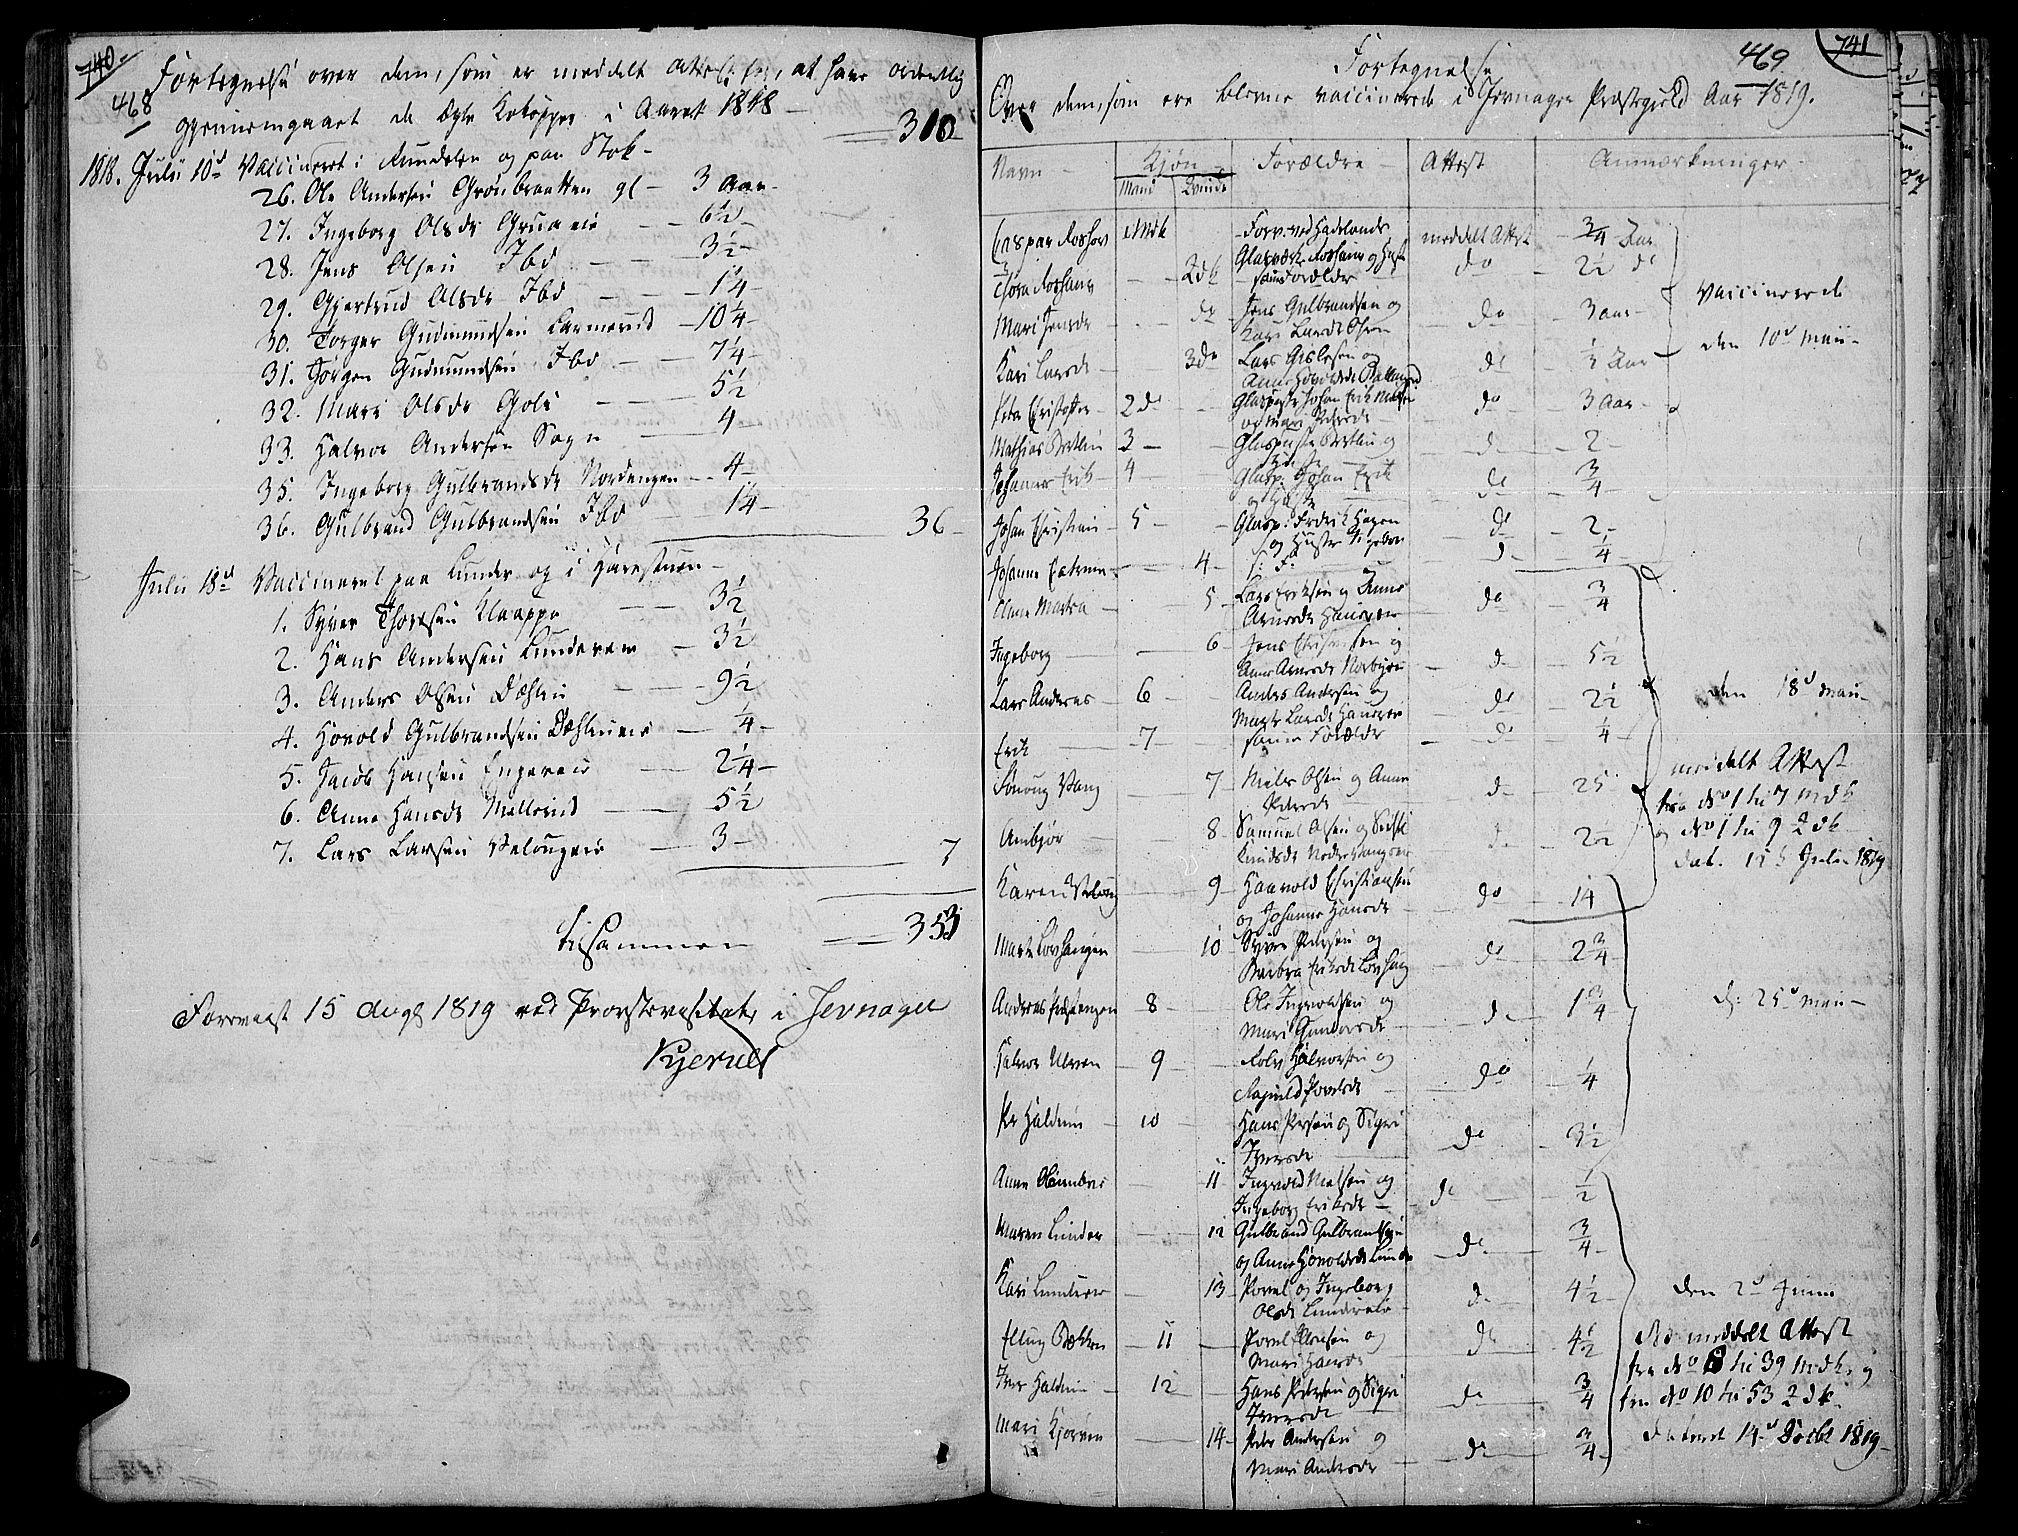 SAH, Jevnaker prestekontor, Ministerialbok nr. 4, 1800-1861, s. 468-469